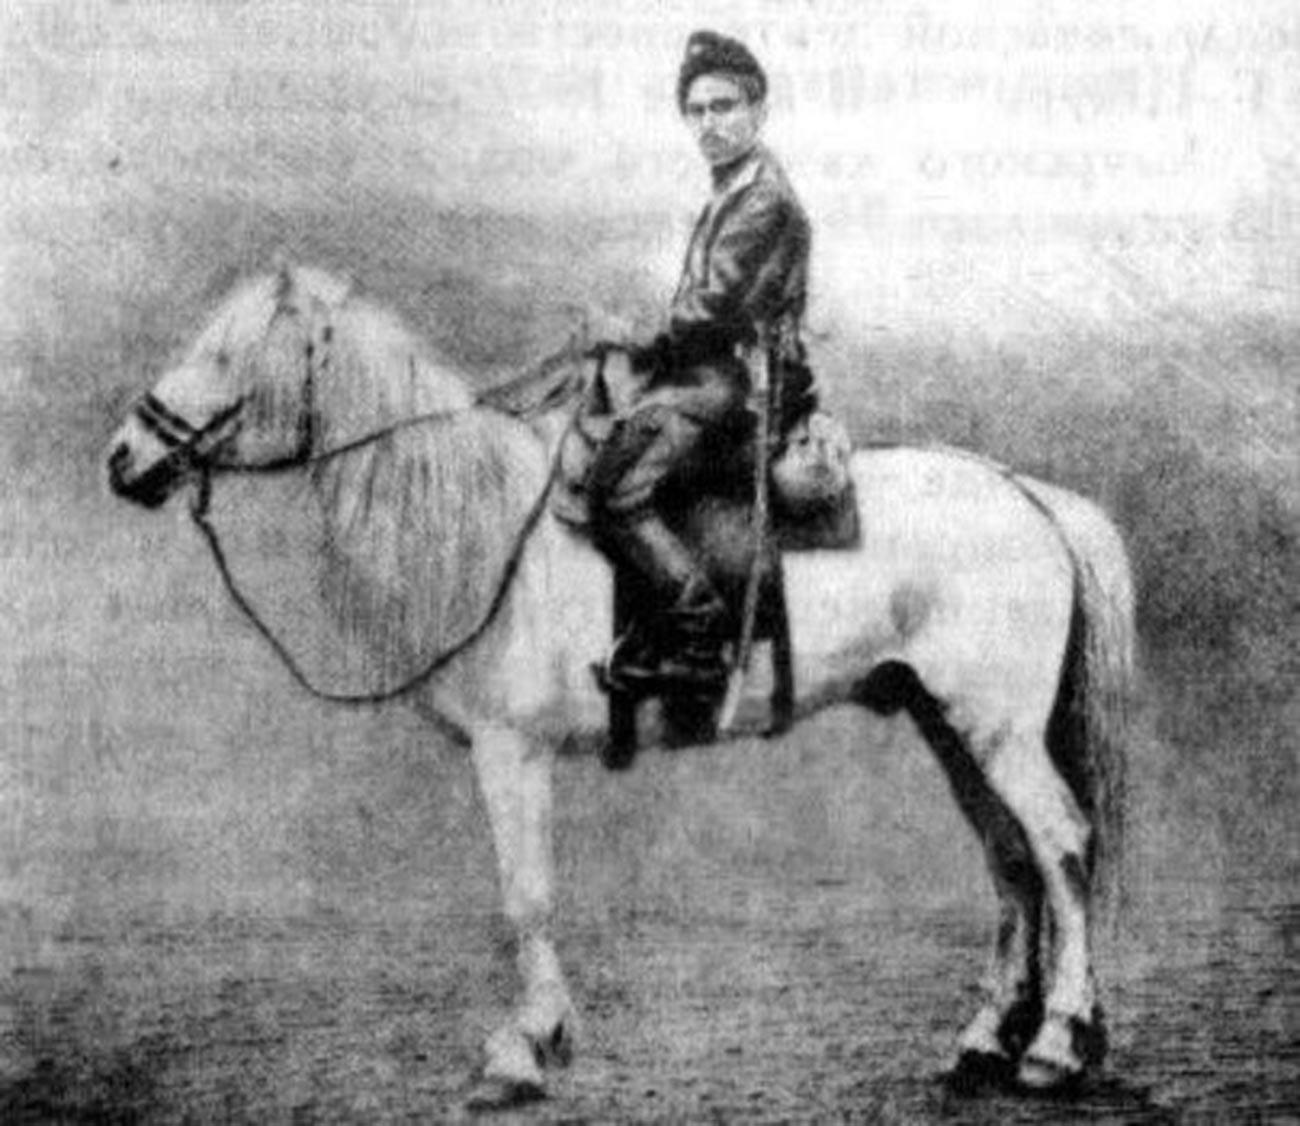 Peshkov di atas kudanya.